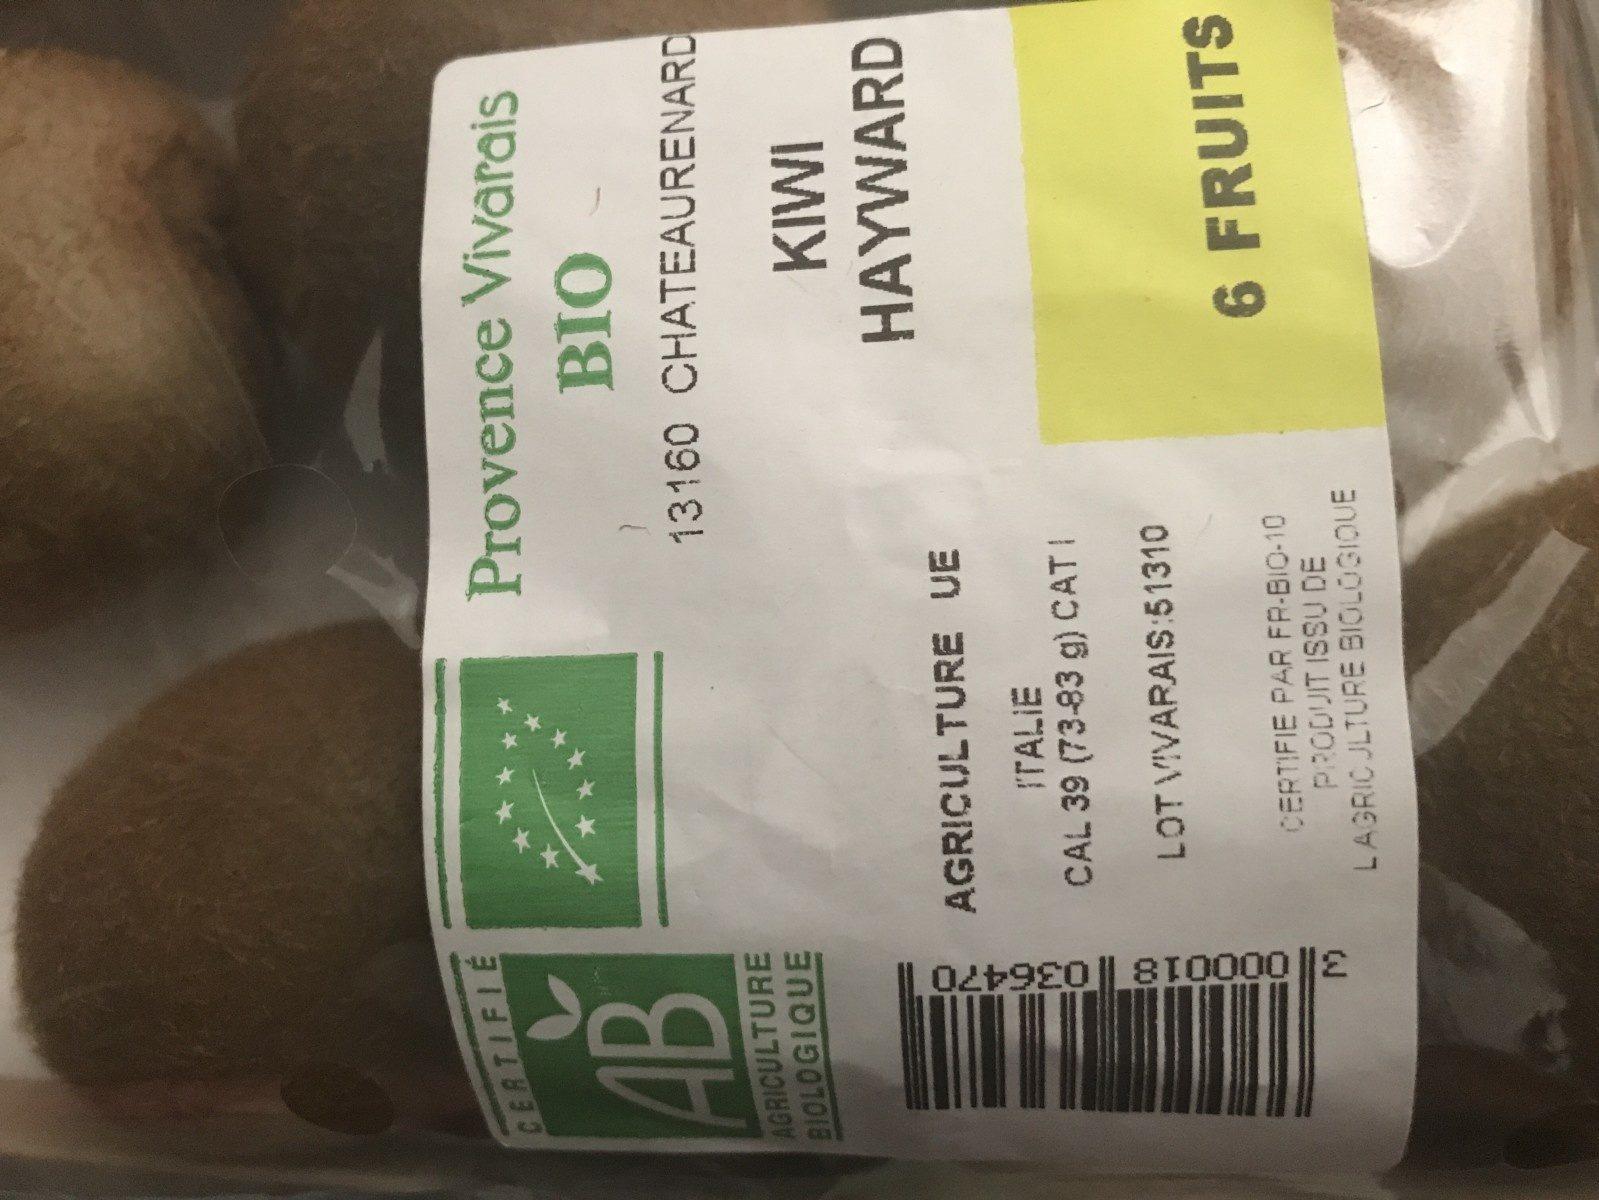 Kiwi hayward - Ingrédients - fr